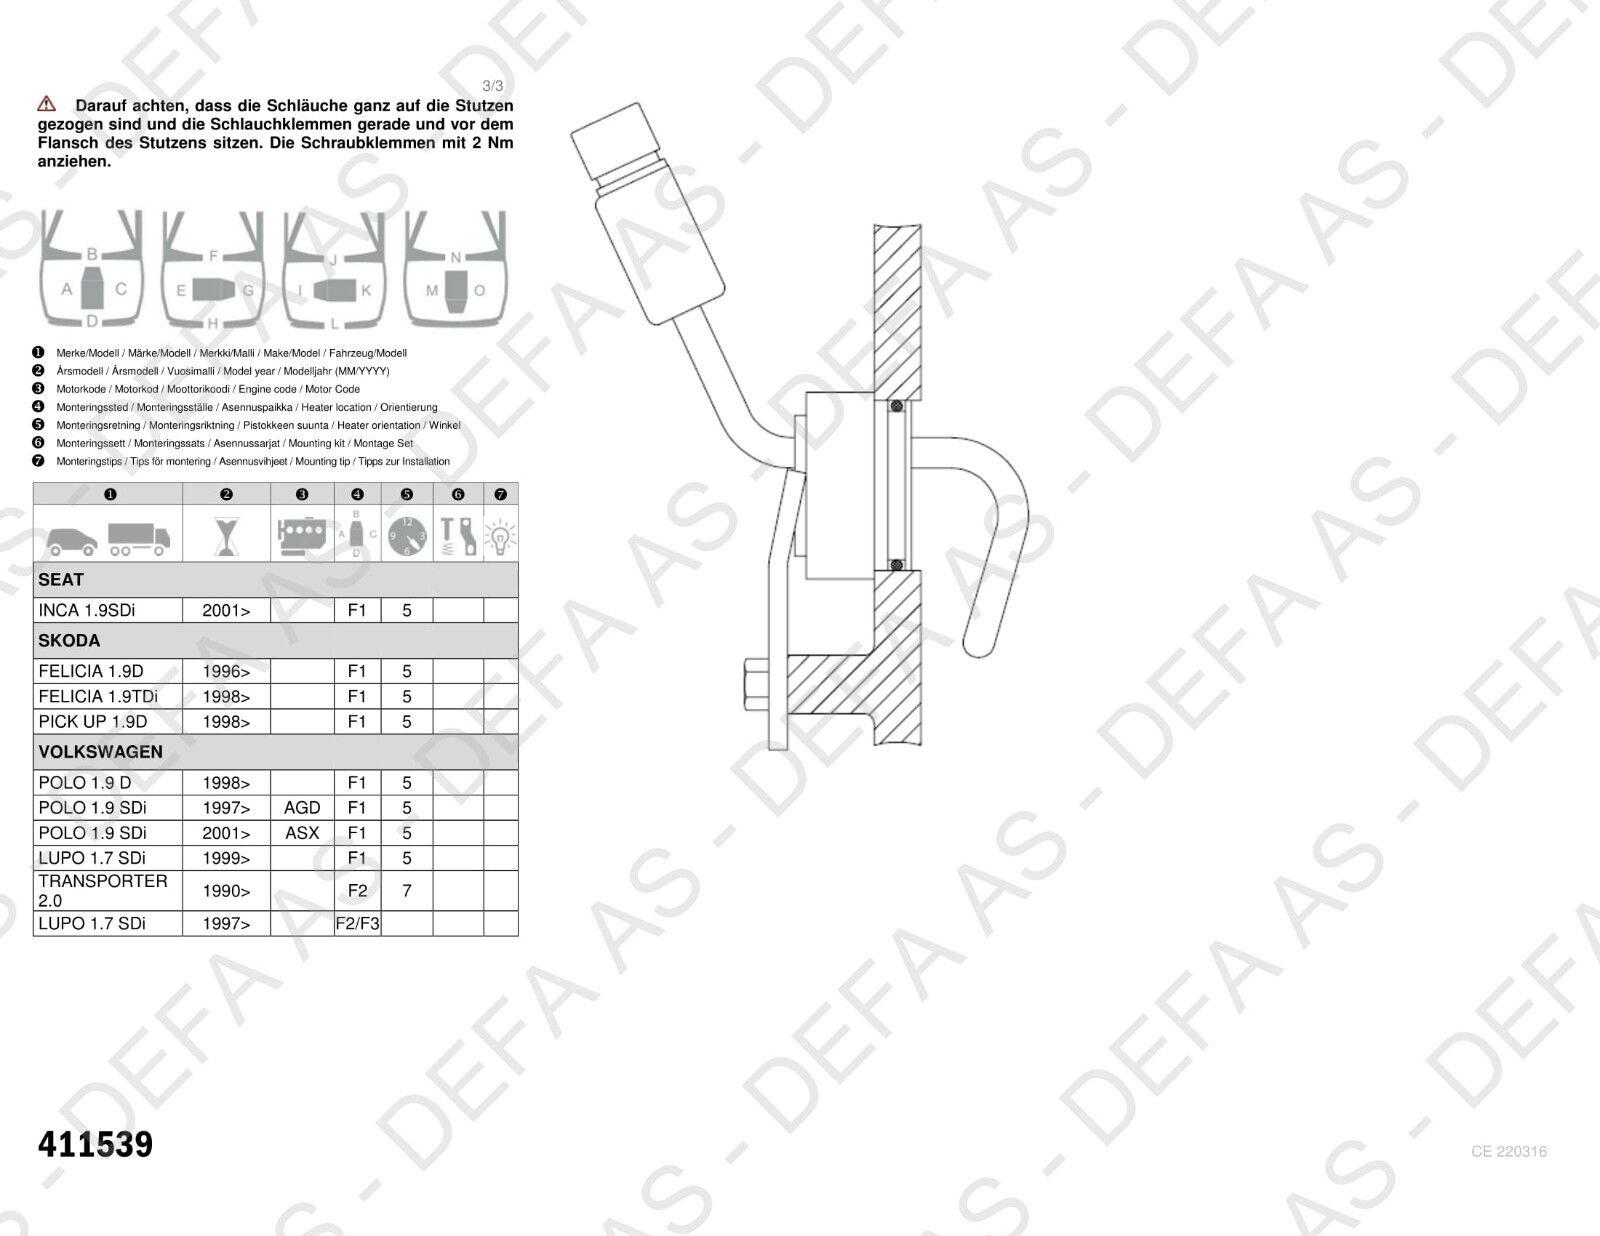 ramy vr8000 wiring diagram 1948 mercury wiring diagram deere gator, Wiring diagram